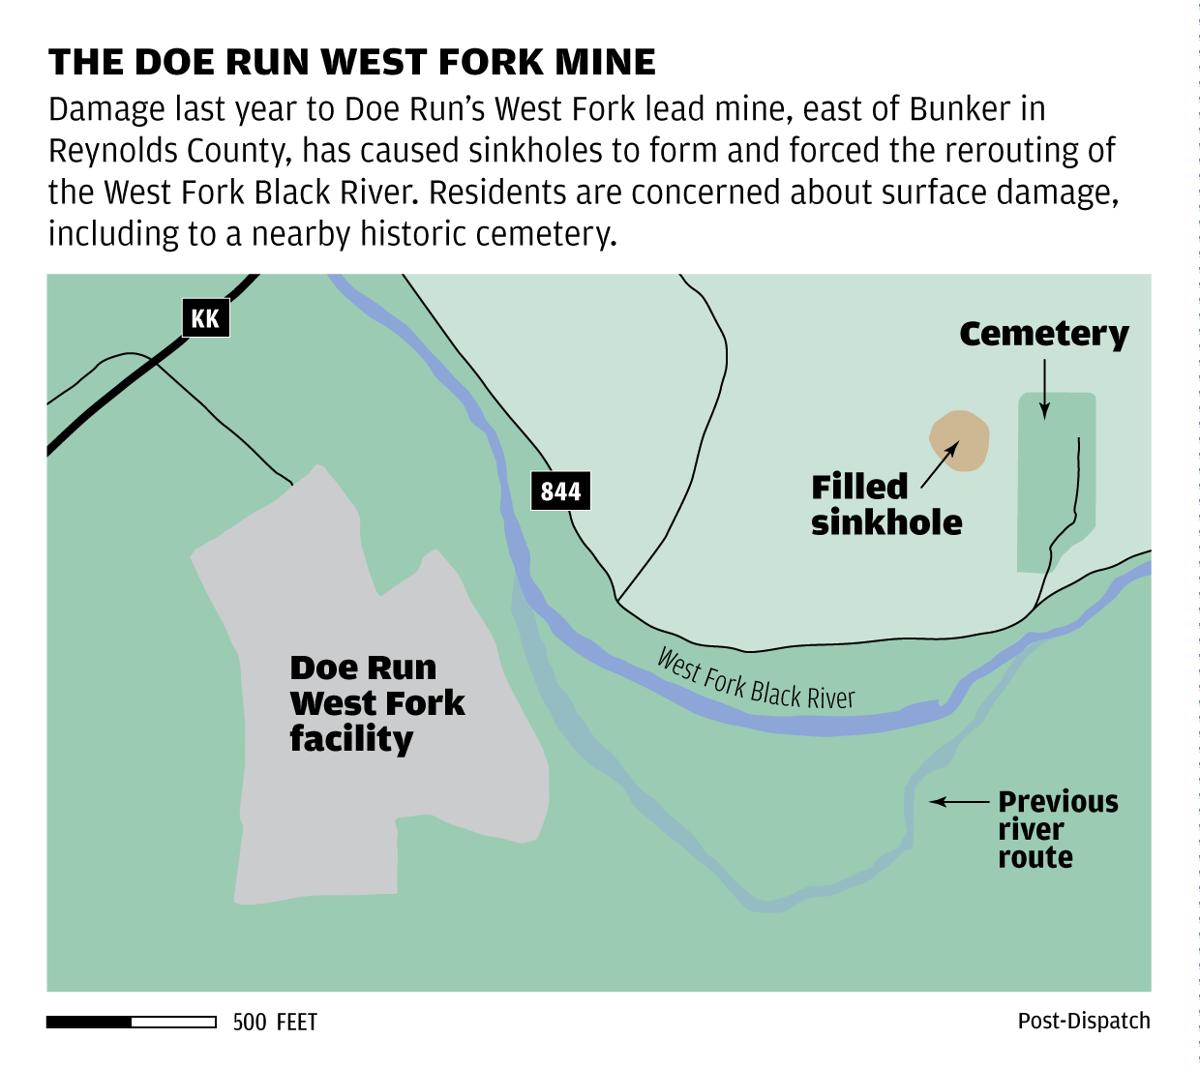 Map: The Doe Run West Fork mine